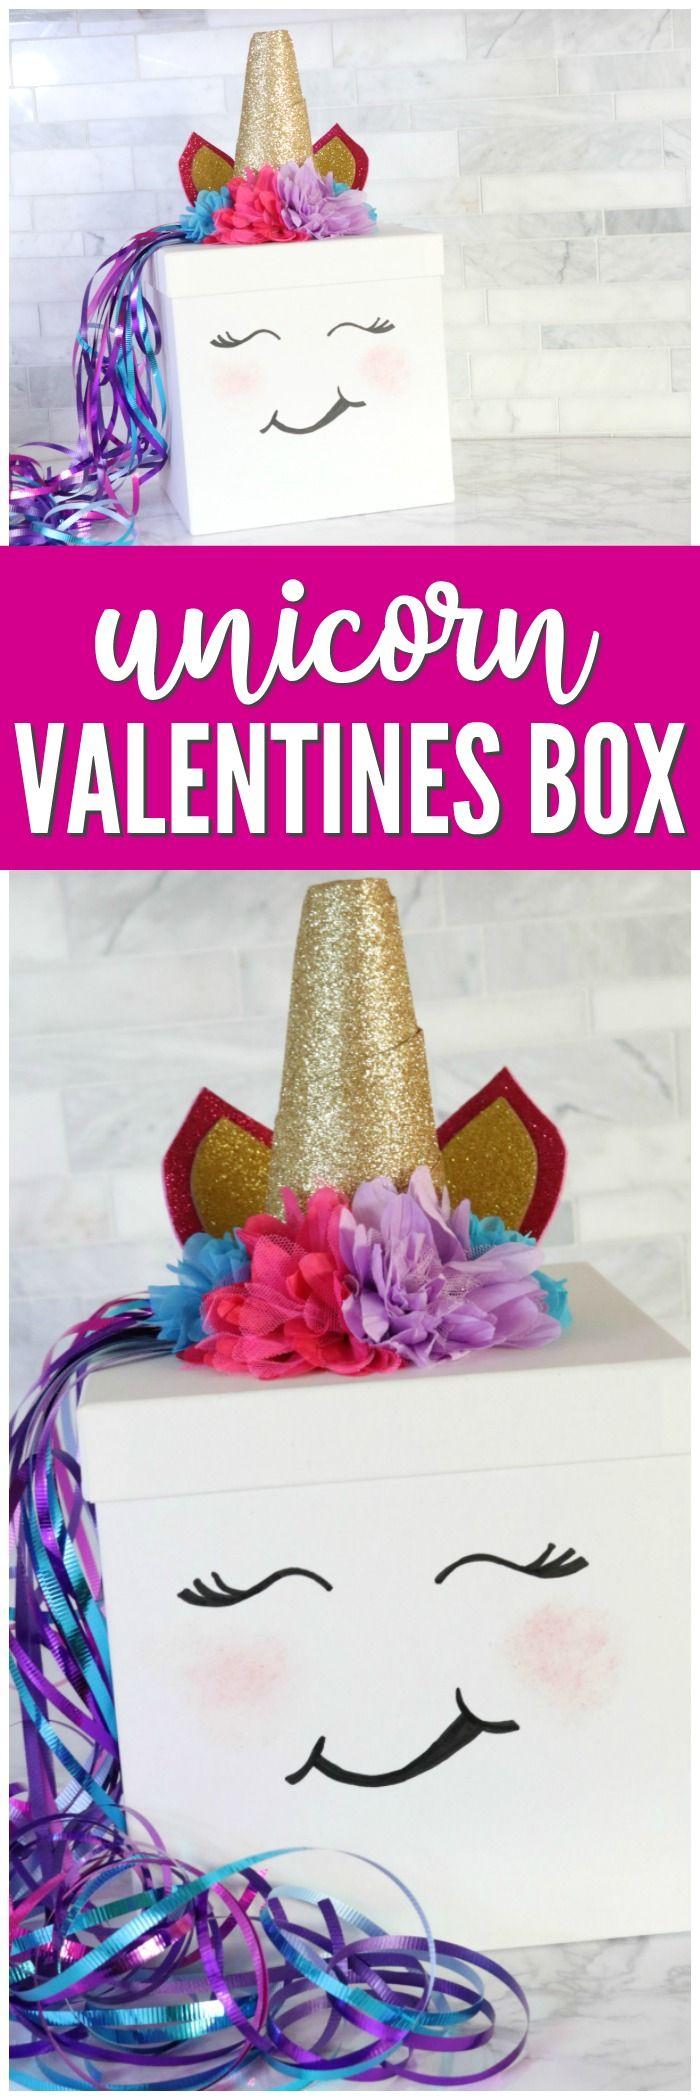 Unicorn Valentines Day Box Idea You Can DIY for School!